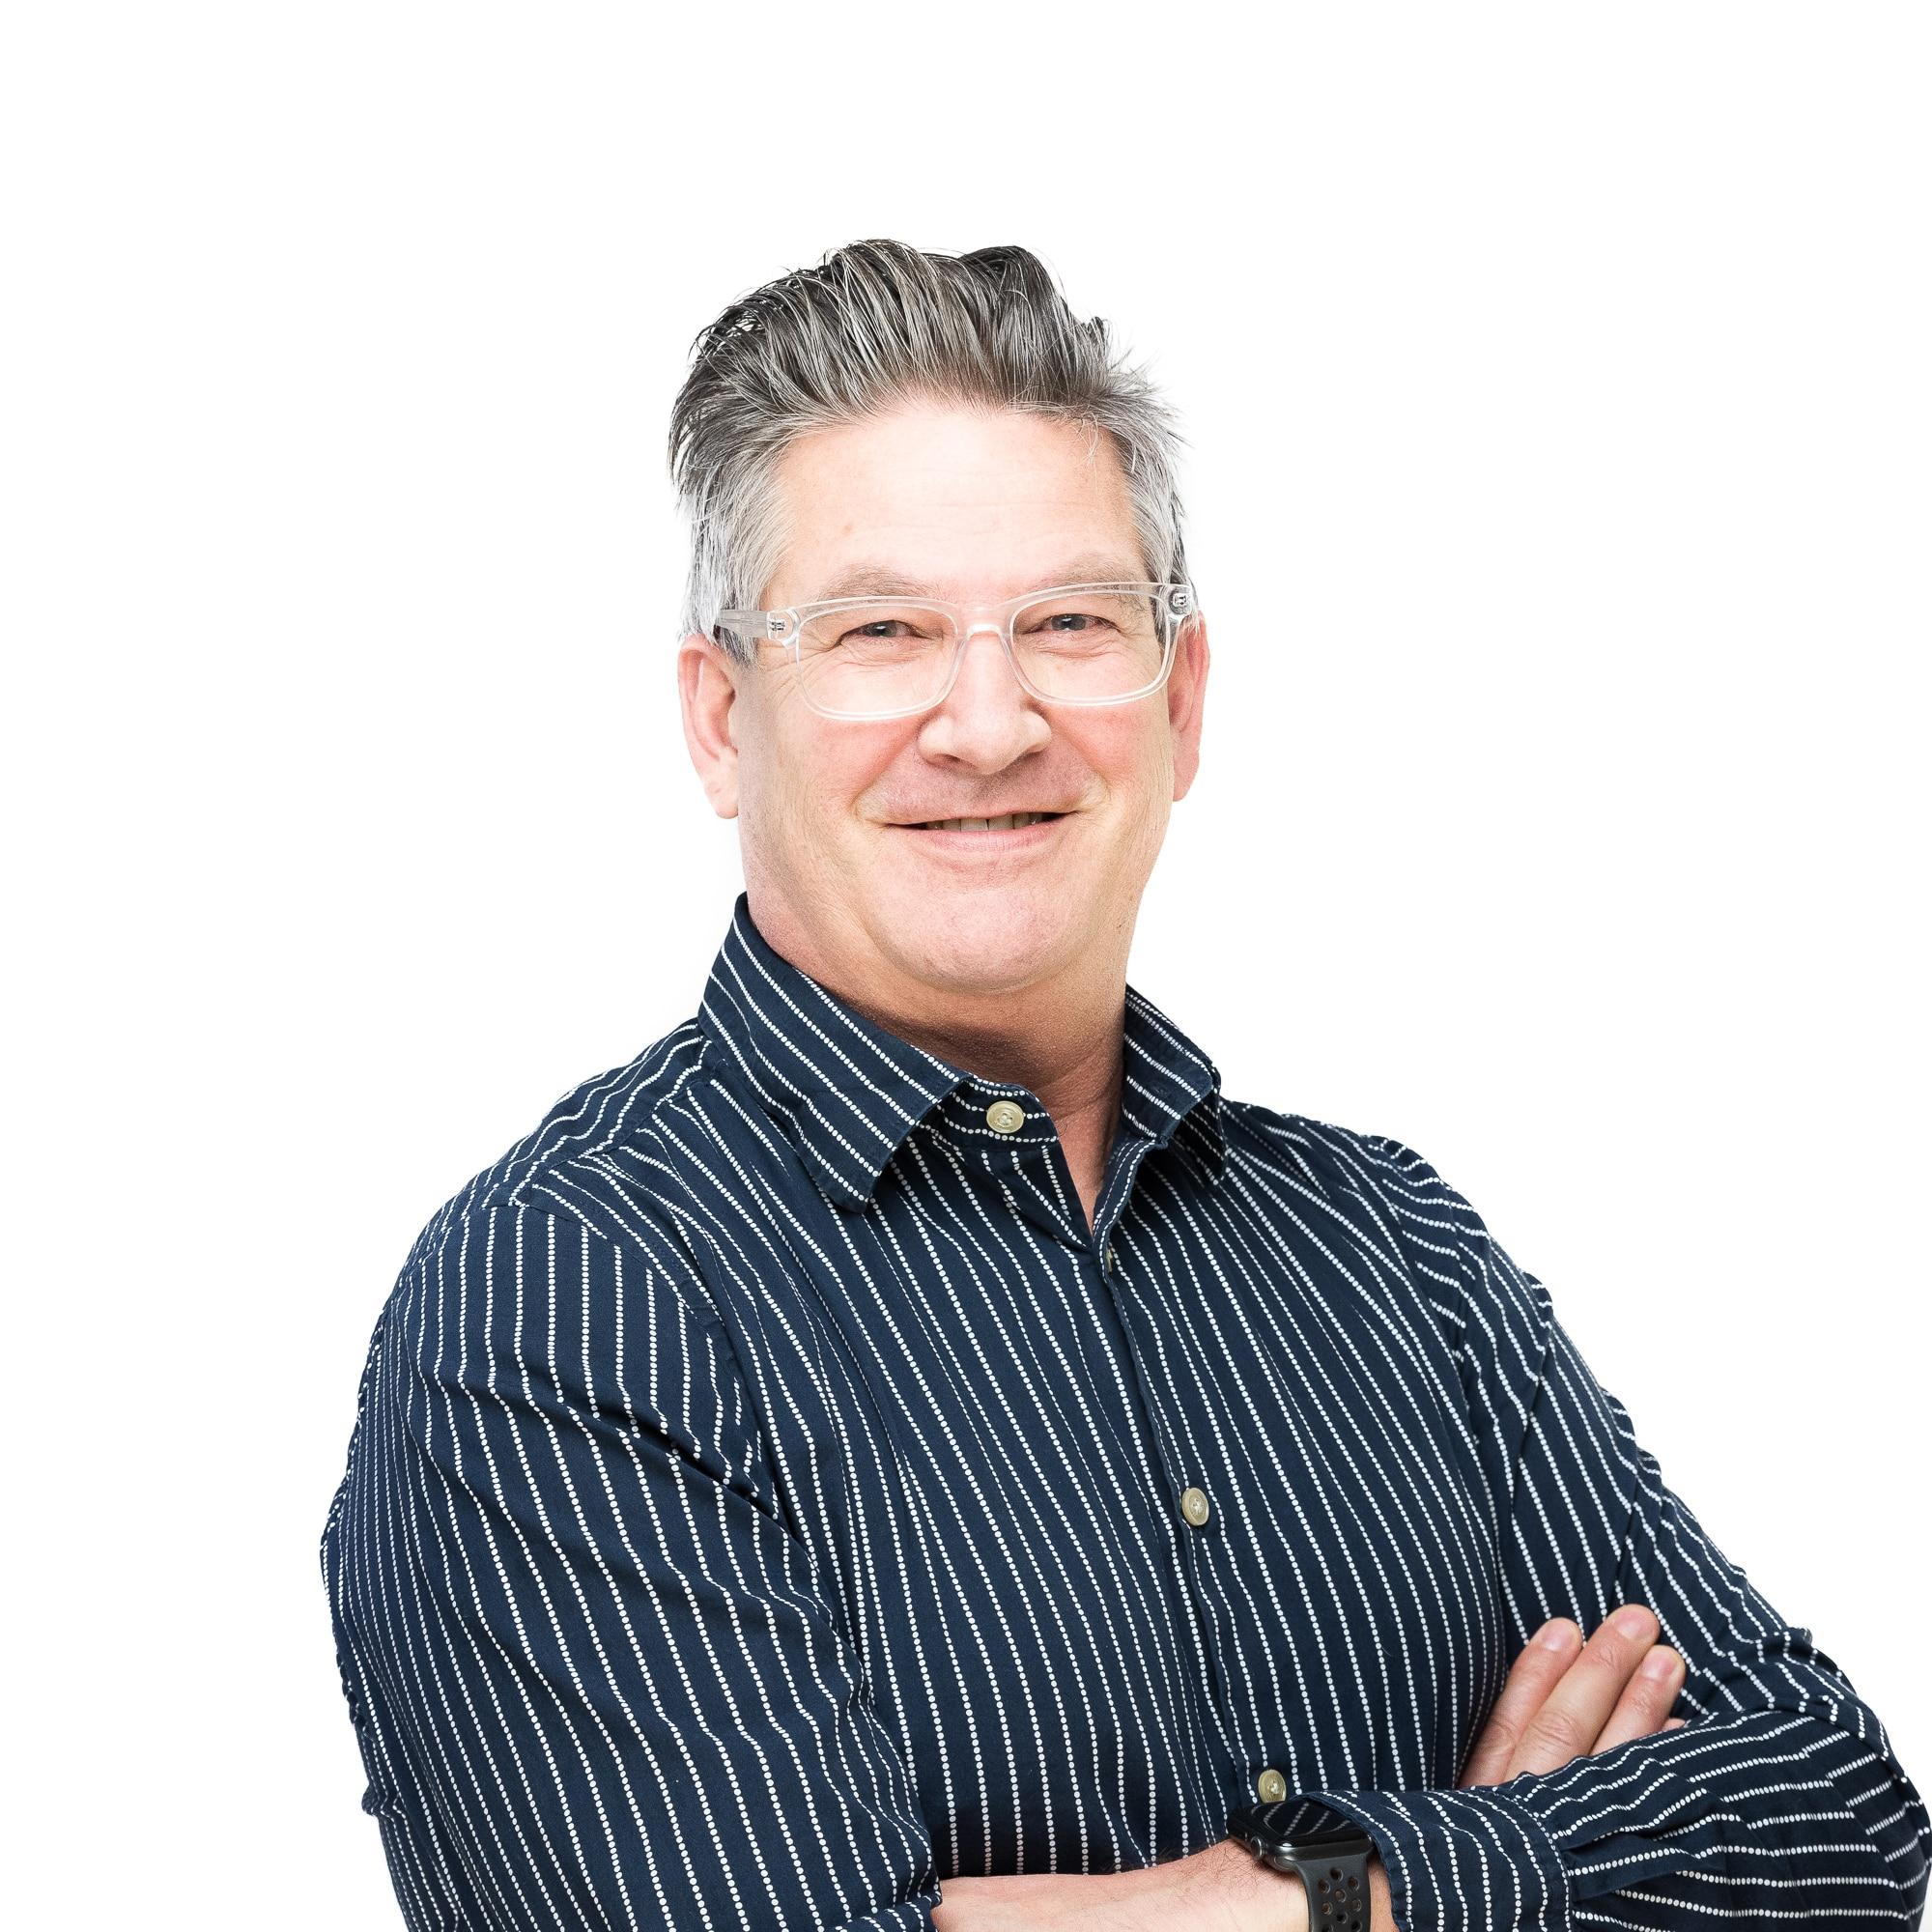 Reijer Jan van t Hul